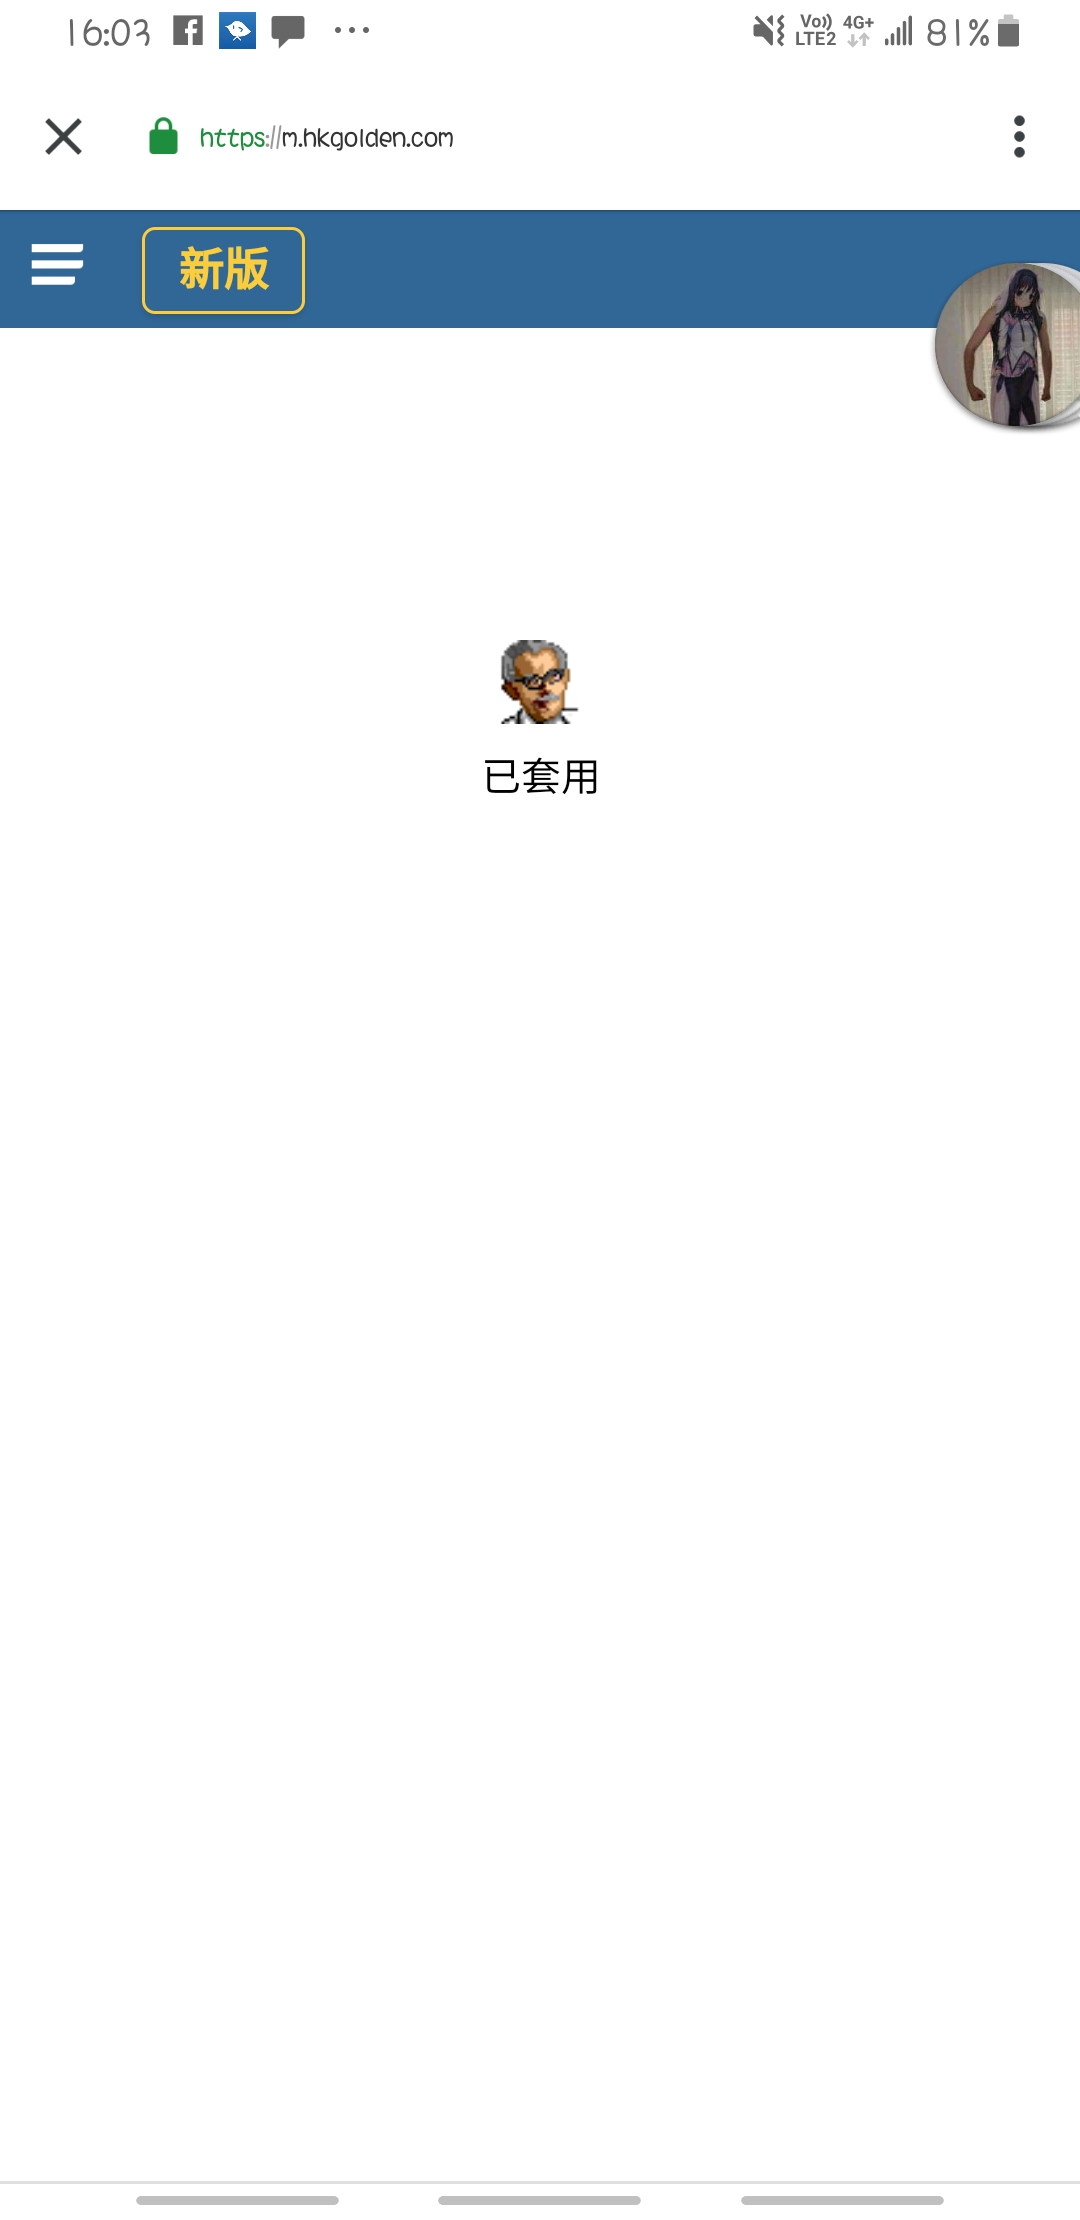 [img]https://upload.cc/i1/2019/08/15/VuCHwD.png[/img]